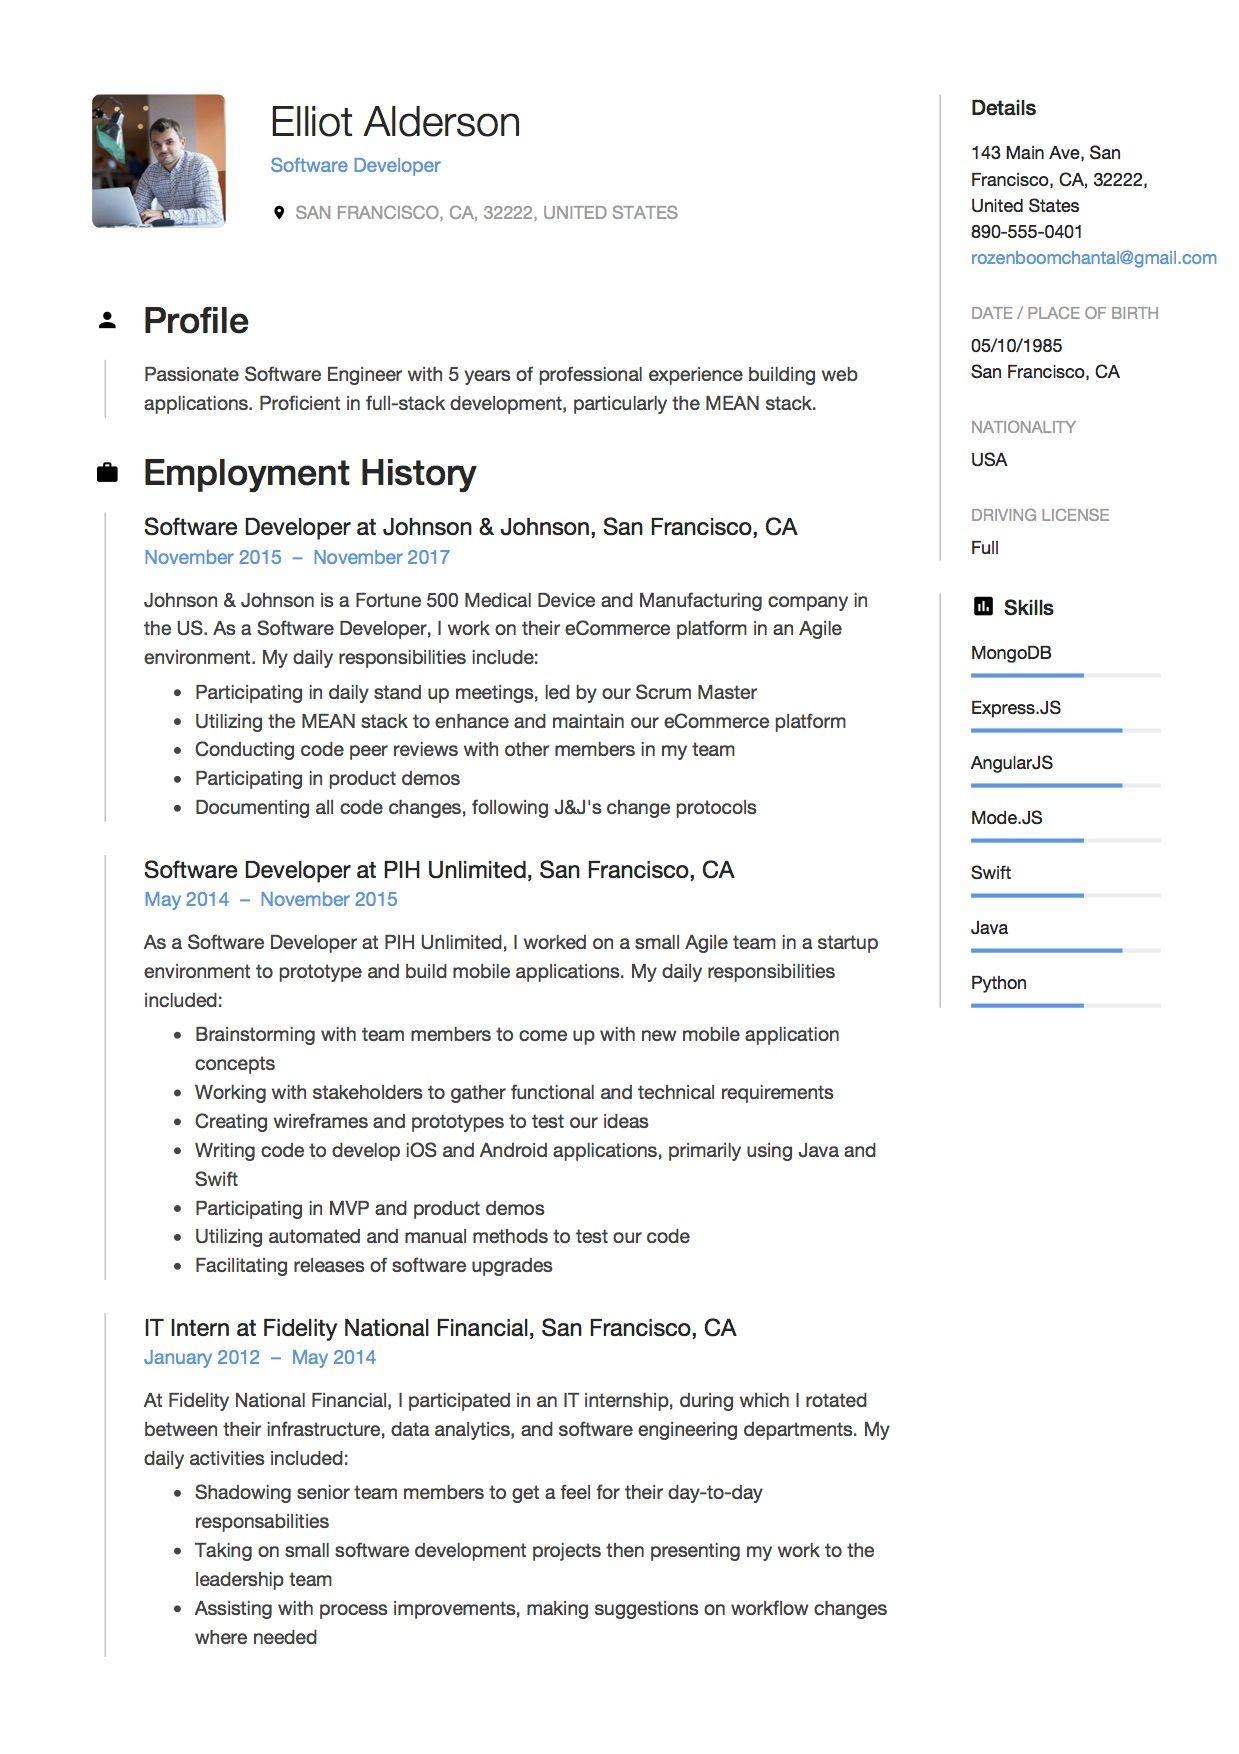 Software Developer Resume Sample, Example, Template